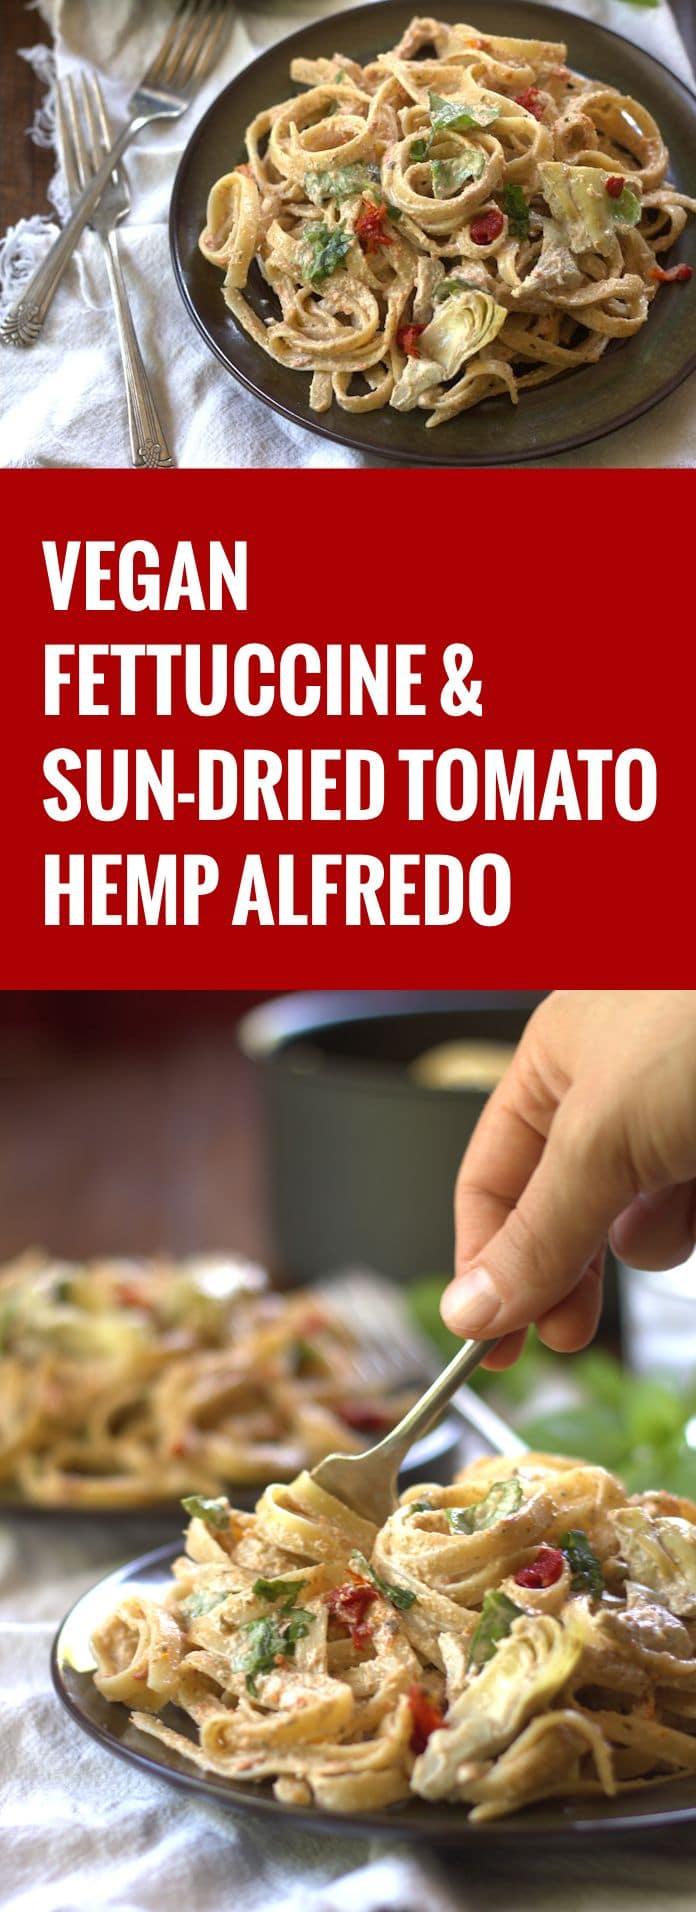 Fettuccine with Artichokes, Basil and Sun-Dried Tomato Hemp Seed Alfredo